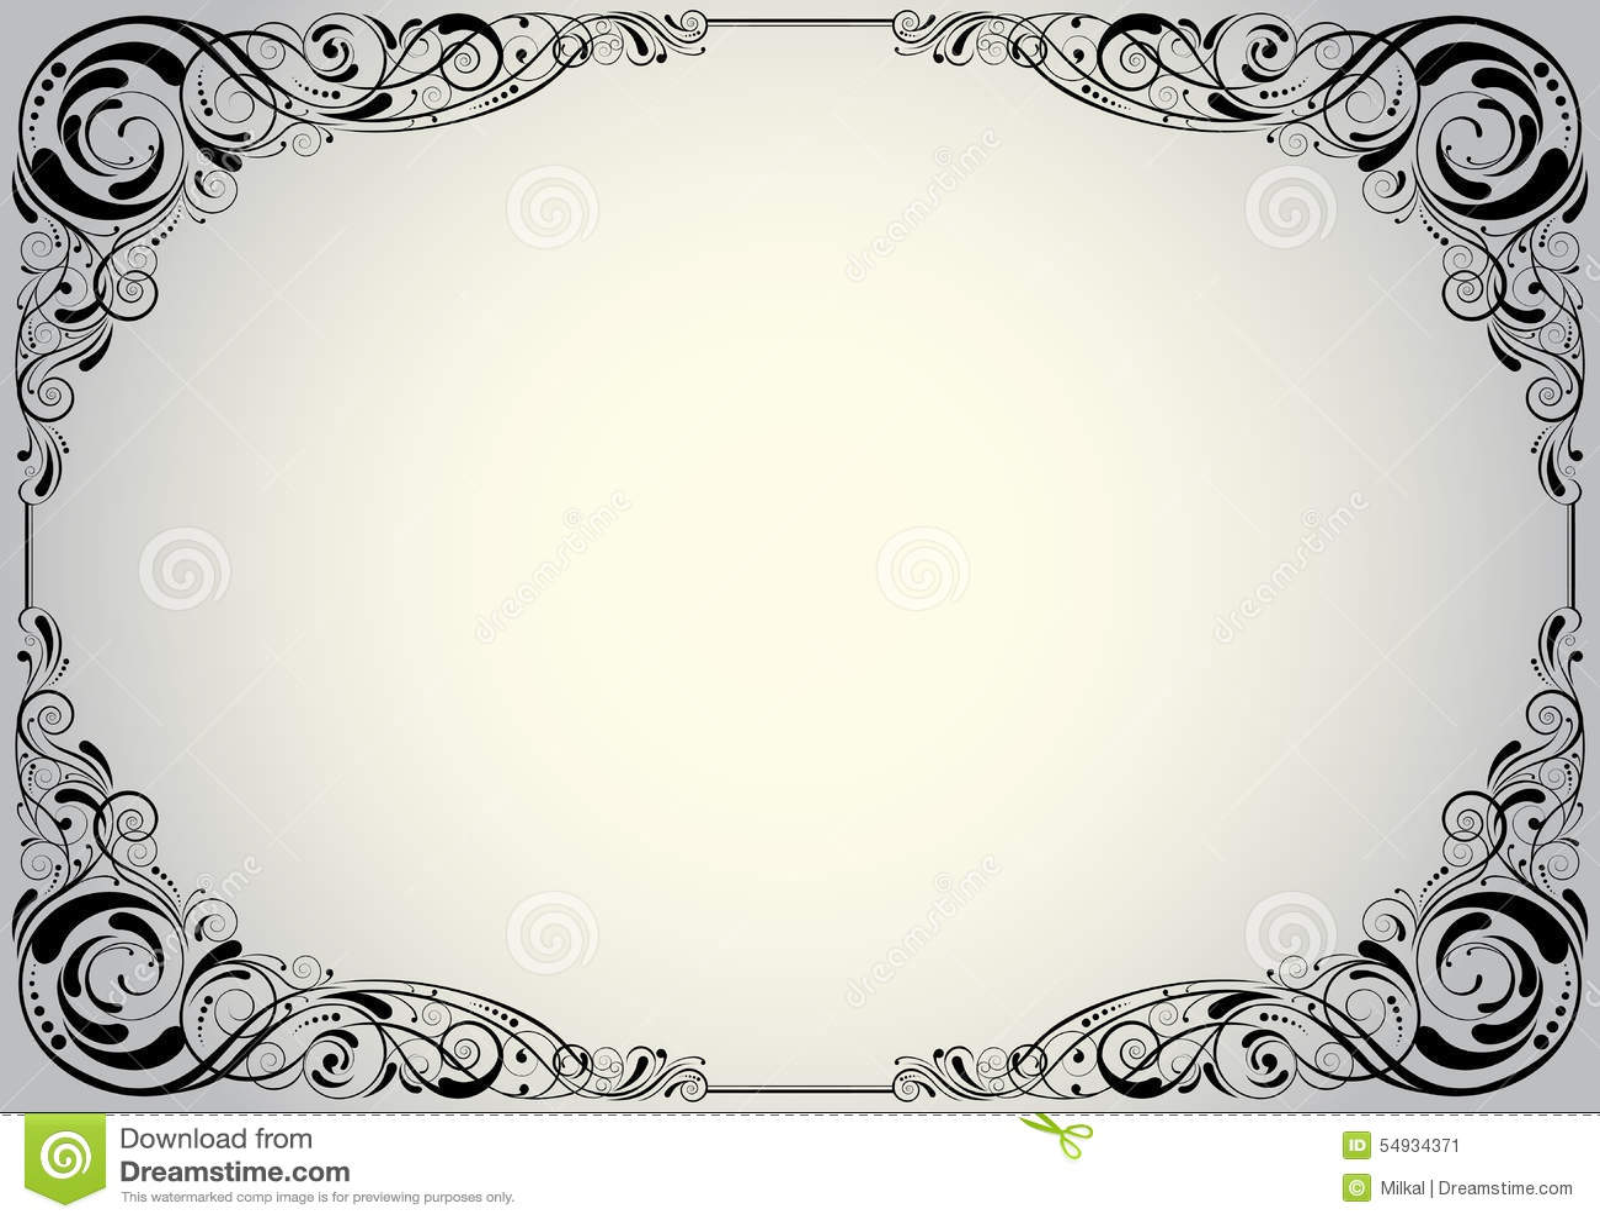 Black Swirl Glasses